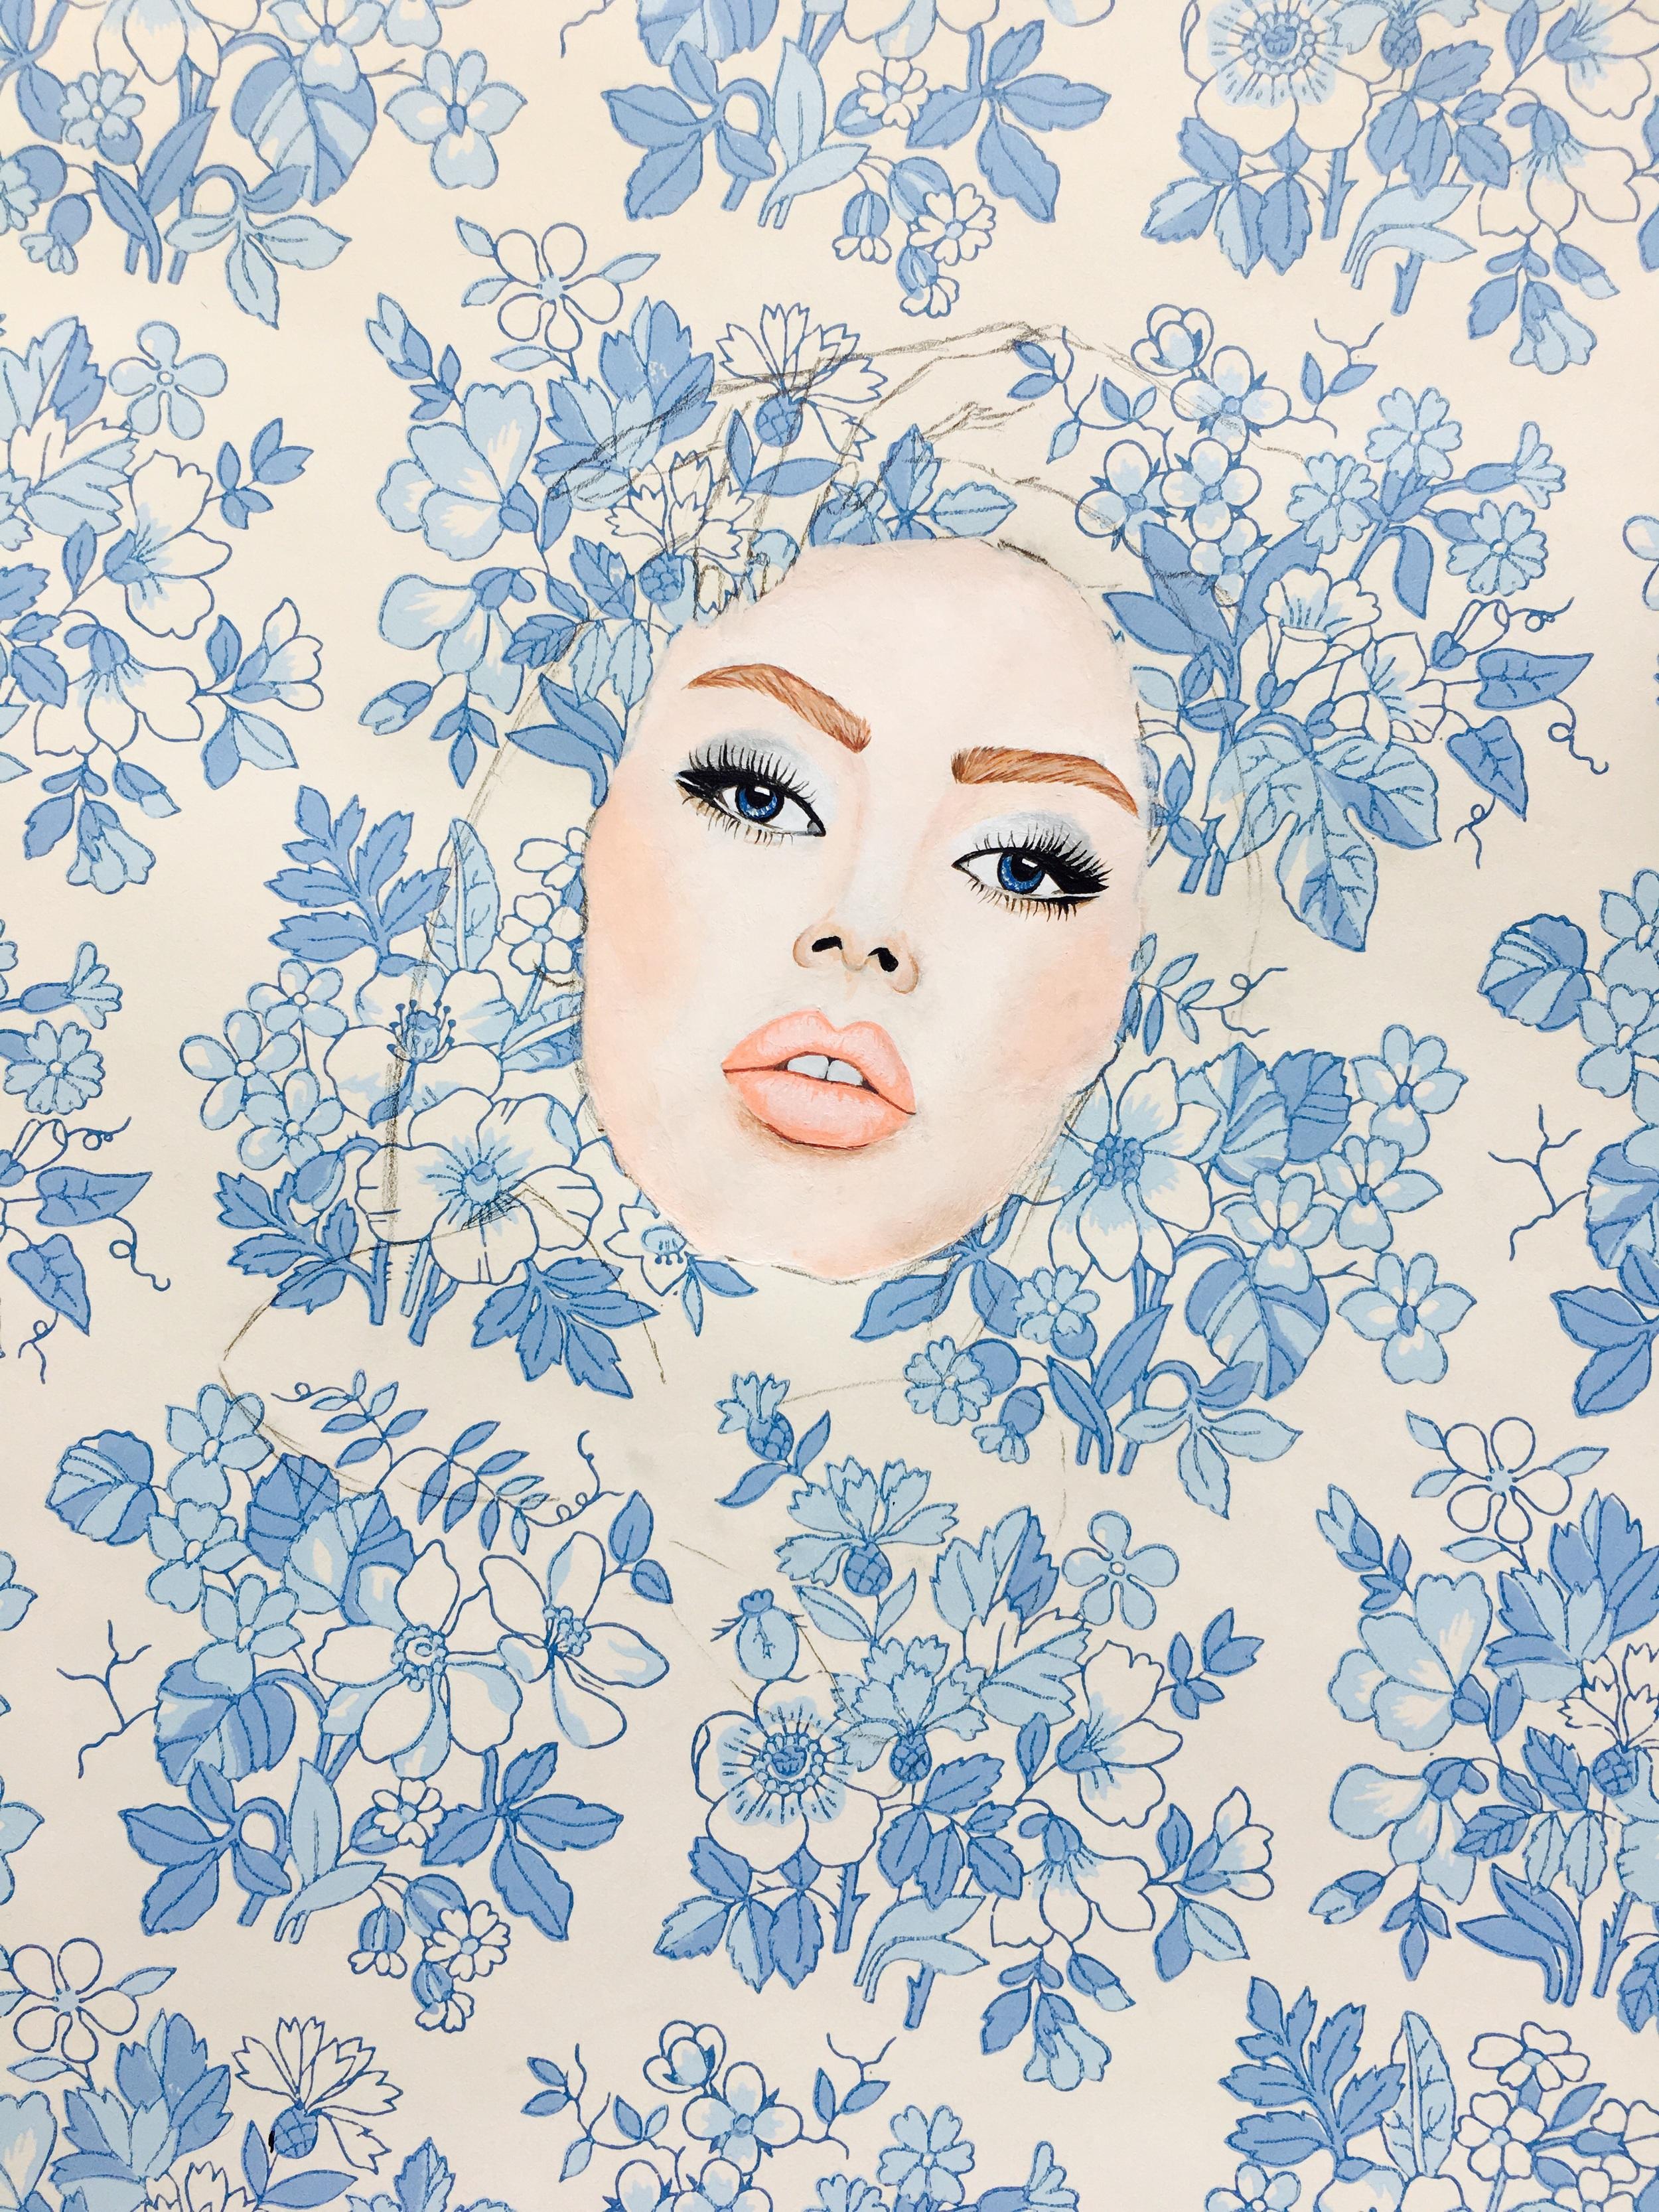 Acrylics on wallpaper